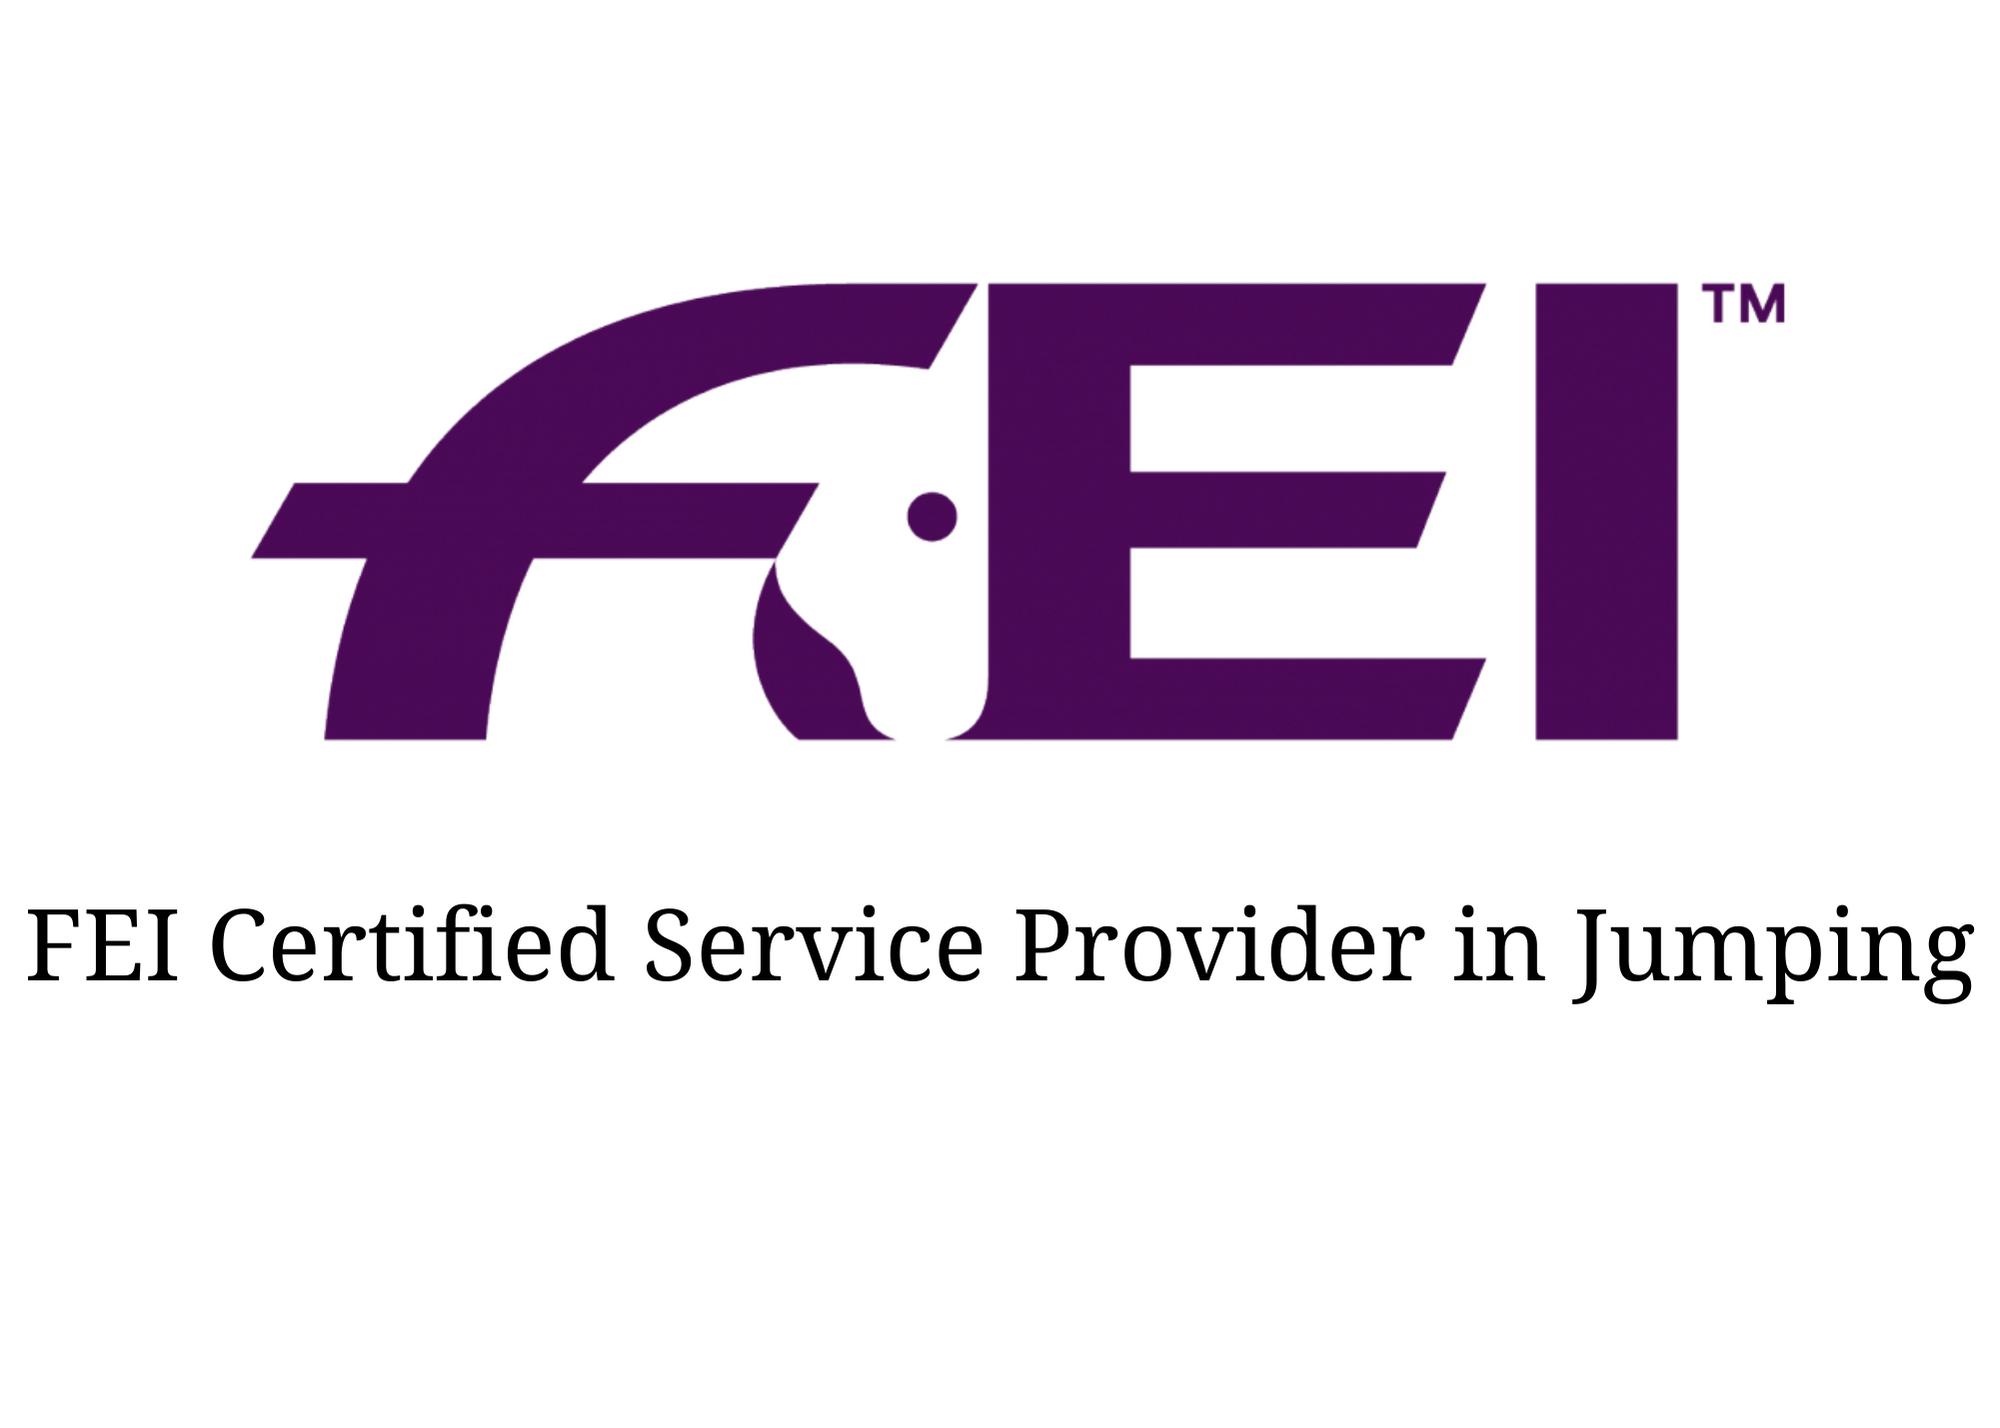 ShowGrounds is an FEI Certified Software